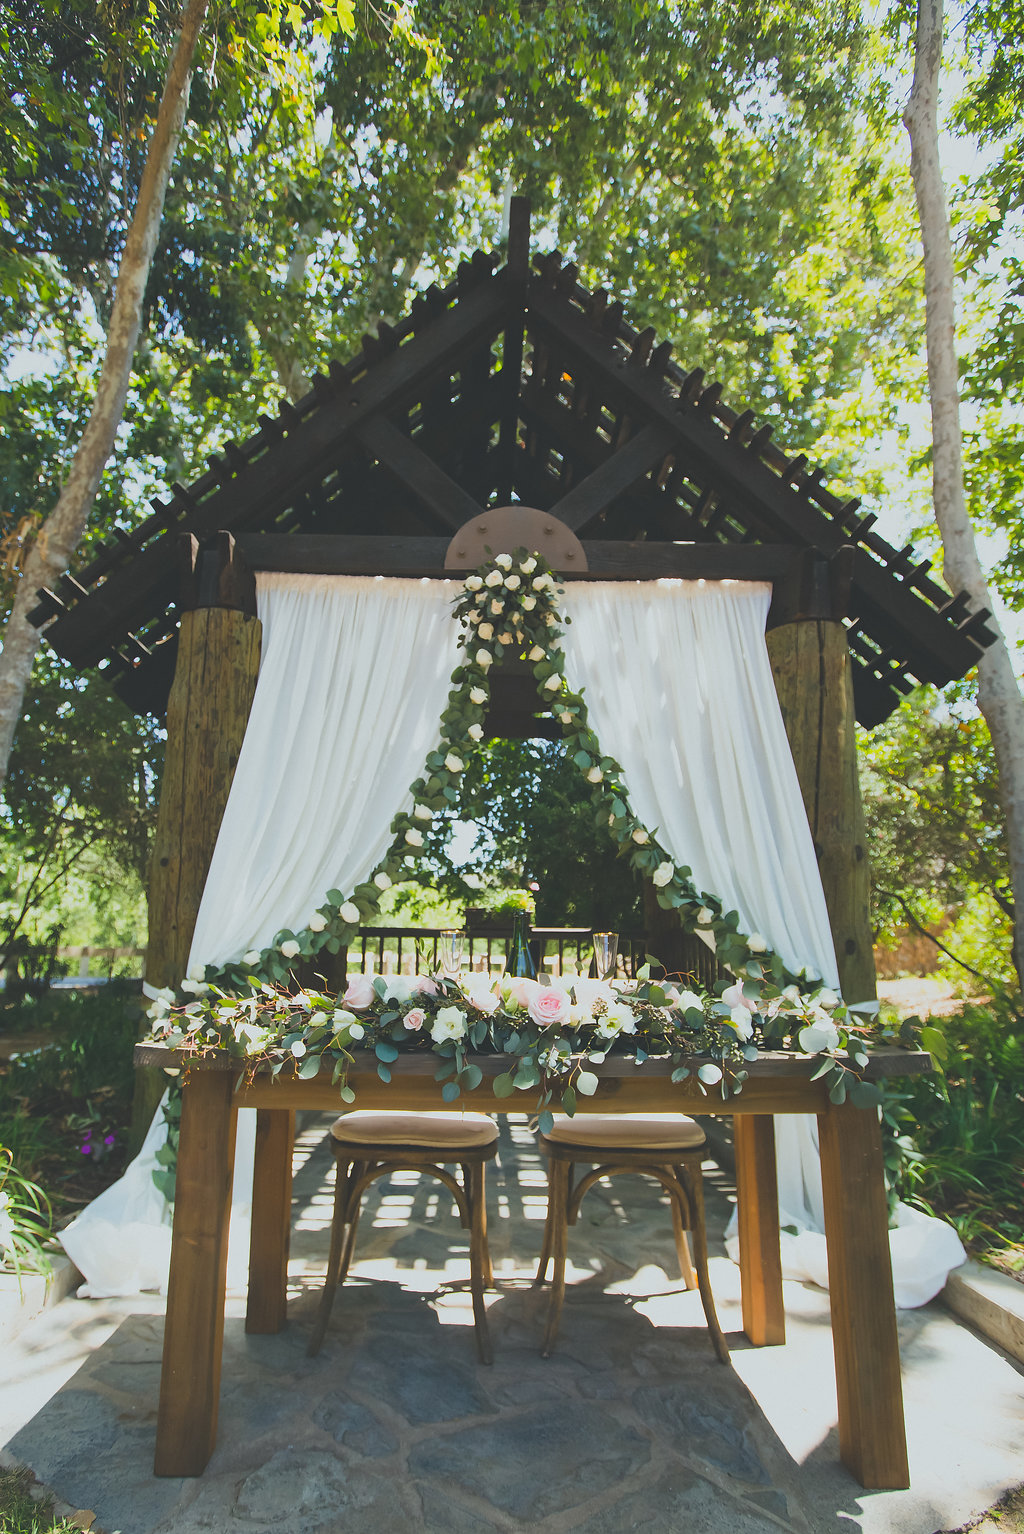 REAL WEDDING | DIY OUTDOOR WEDDING IN CALIFORNIA | David Nget Photography | Pretty Pear Bride